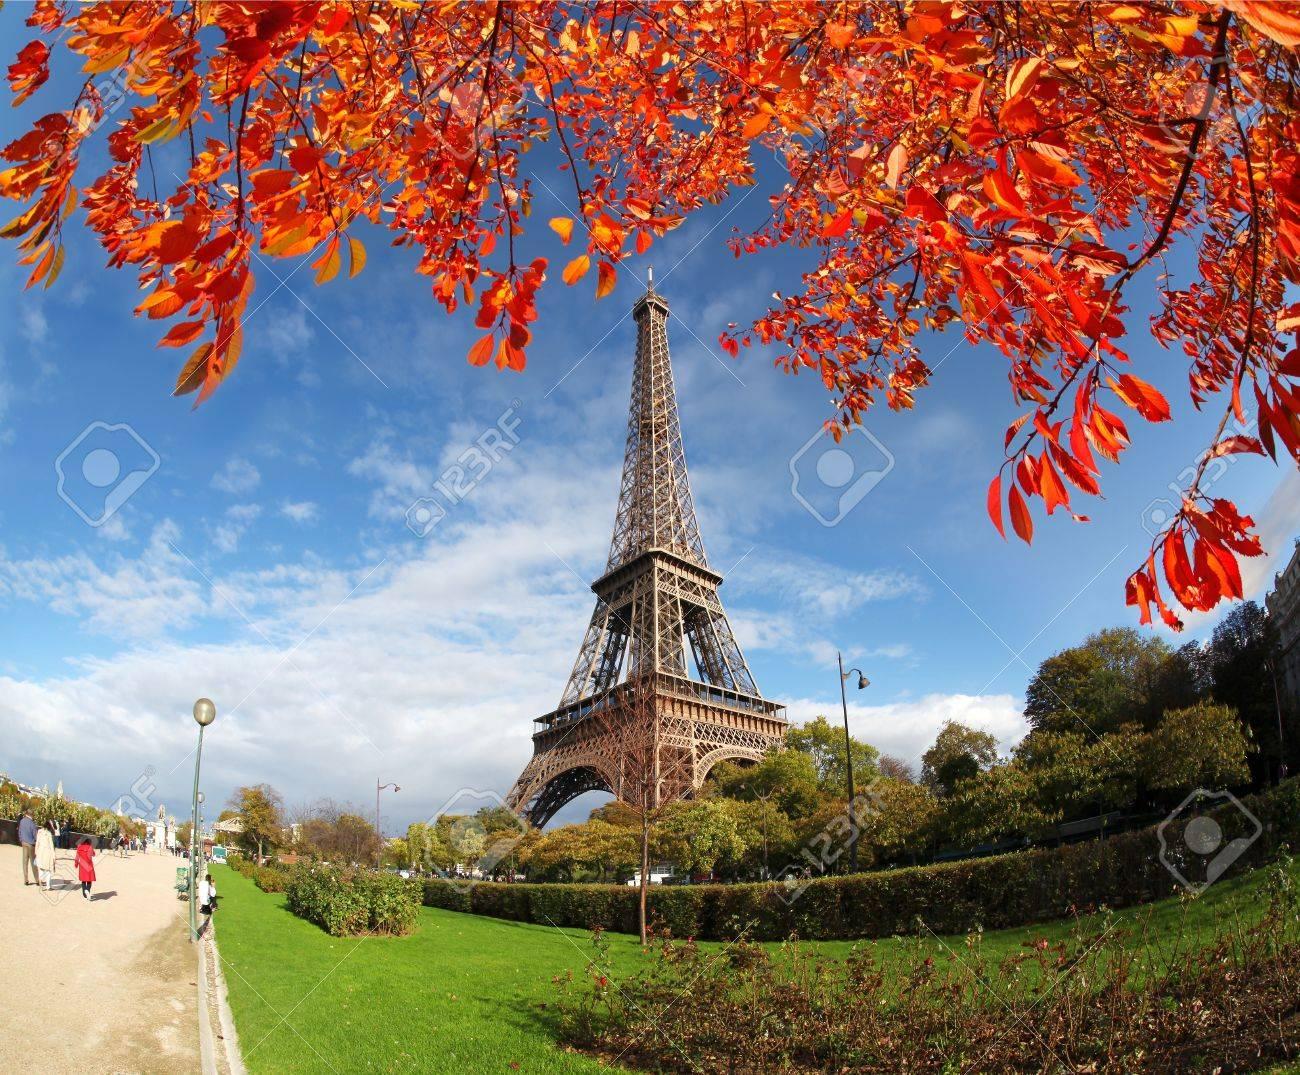 Eiffel tower against autumn tree in Paris, France - 15987037